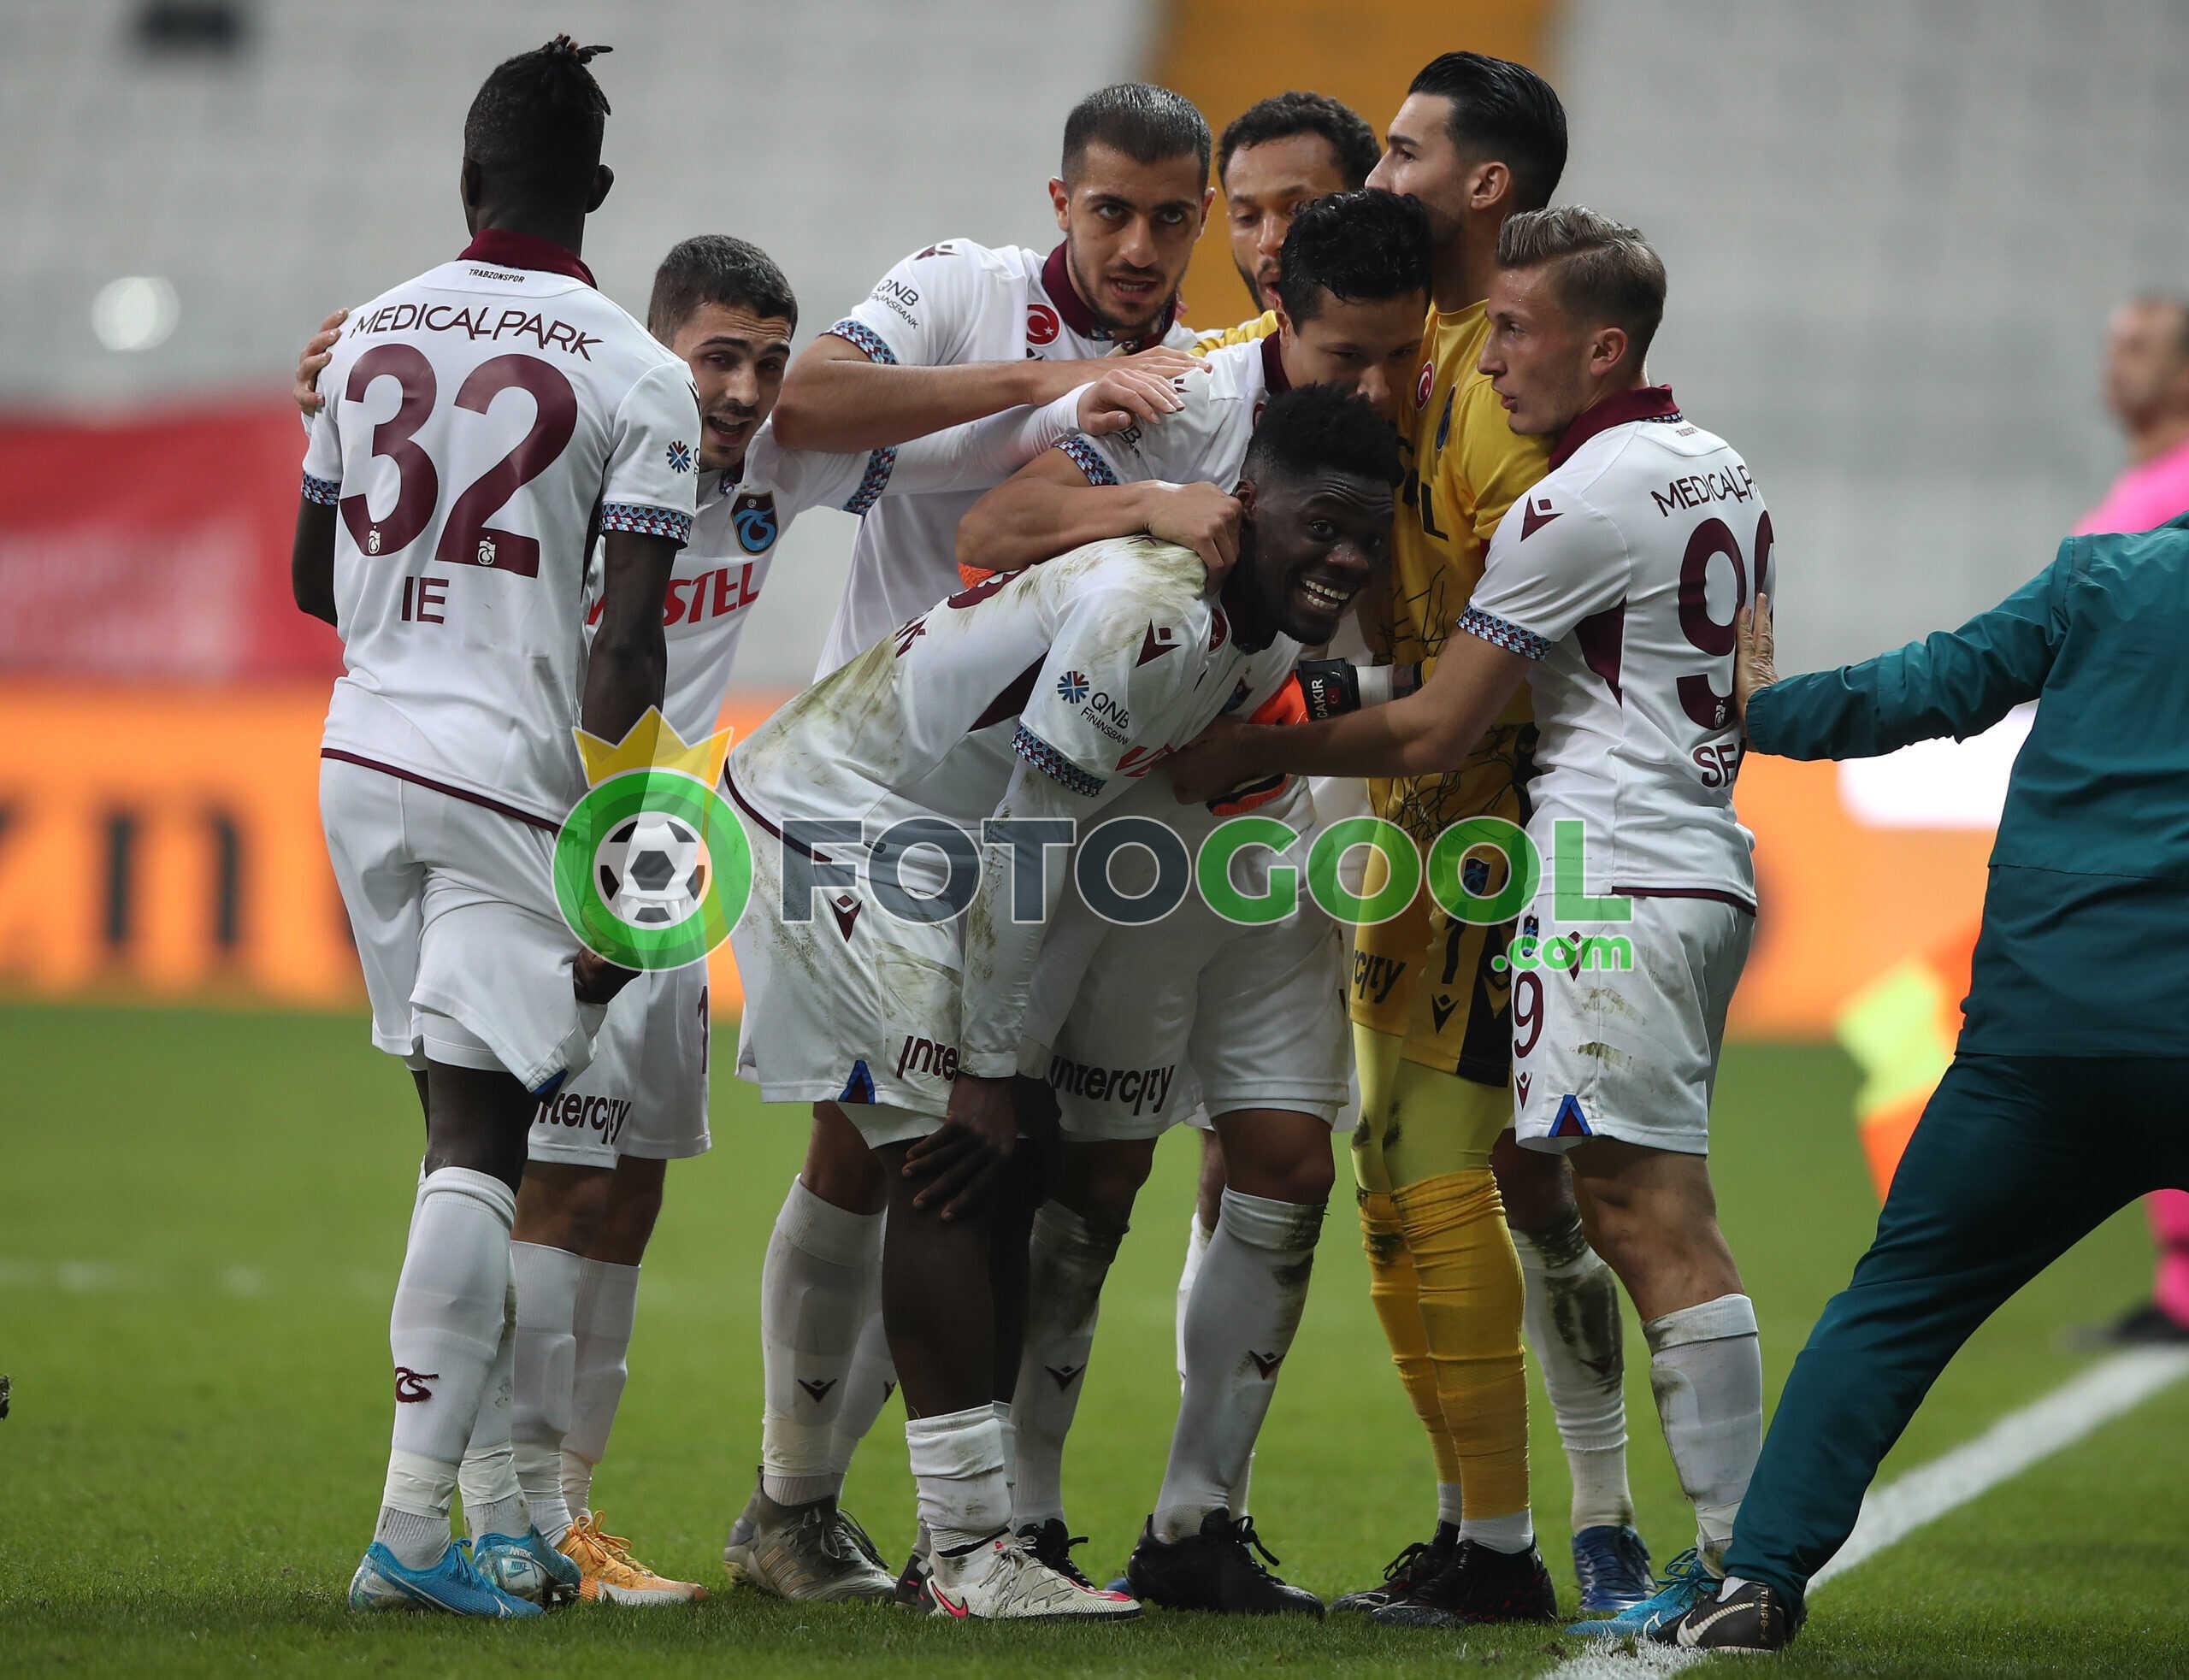 Trabzon fırtınası bu kez İstanbulda esti 1-2